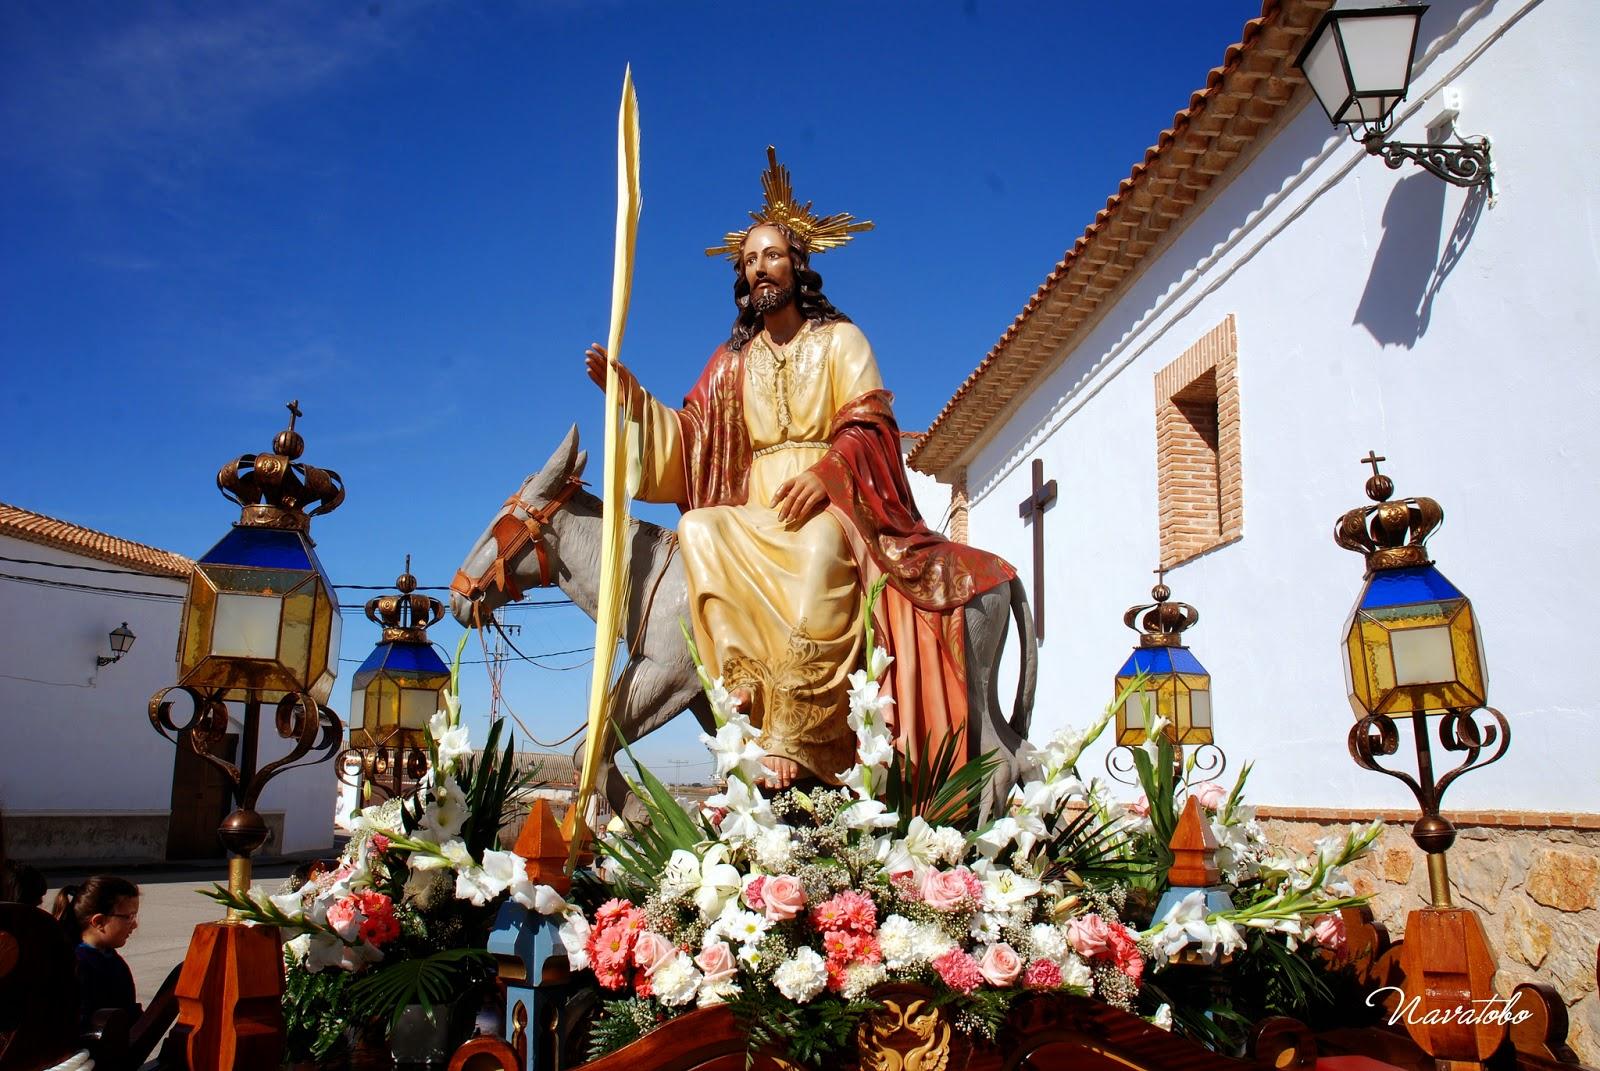 Semana Santa de El Toboso